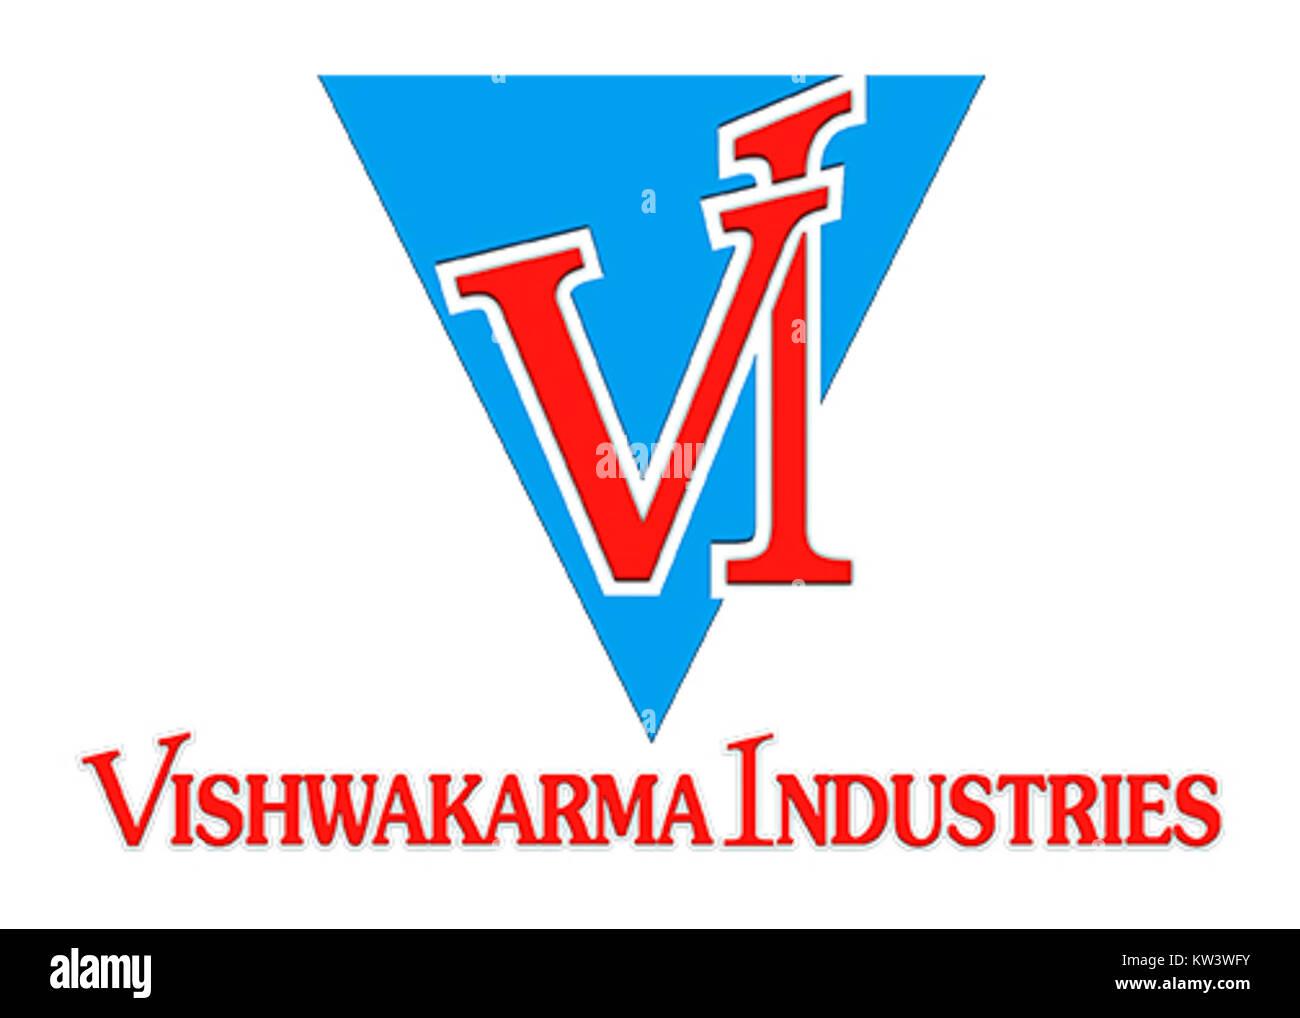 Vishakarma Industries Logo - Stock Image